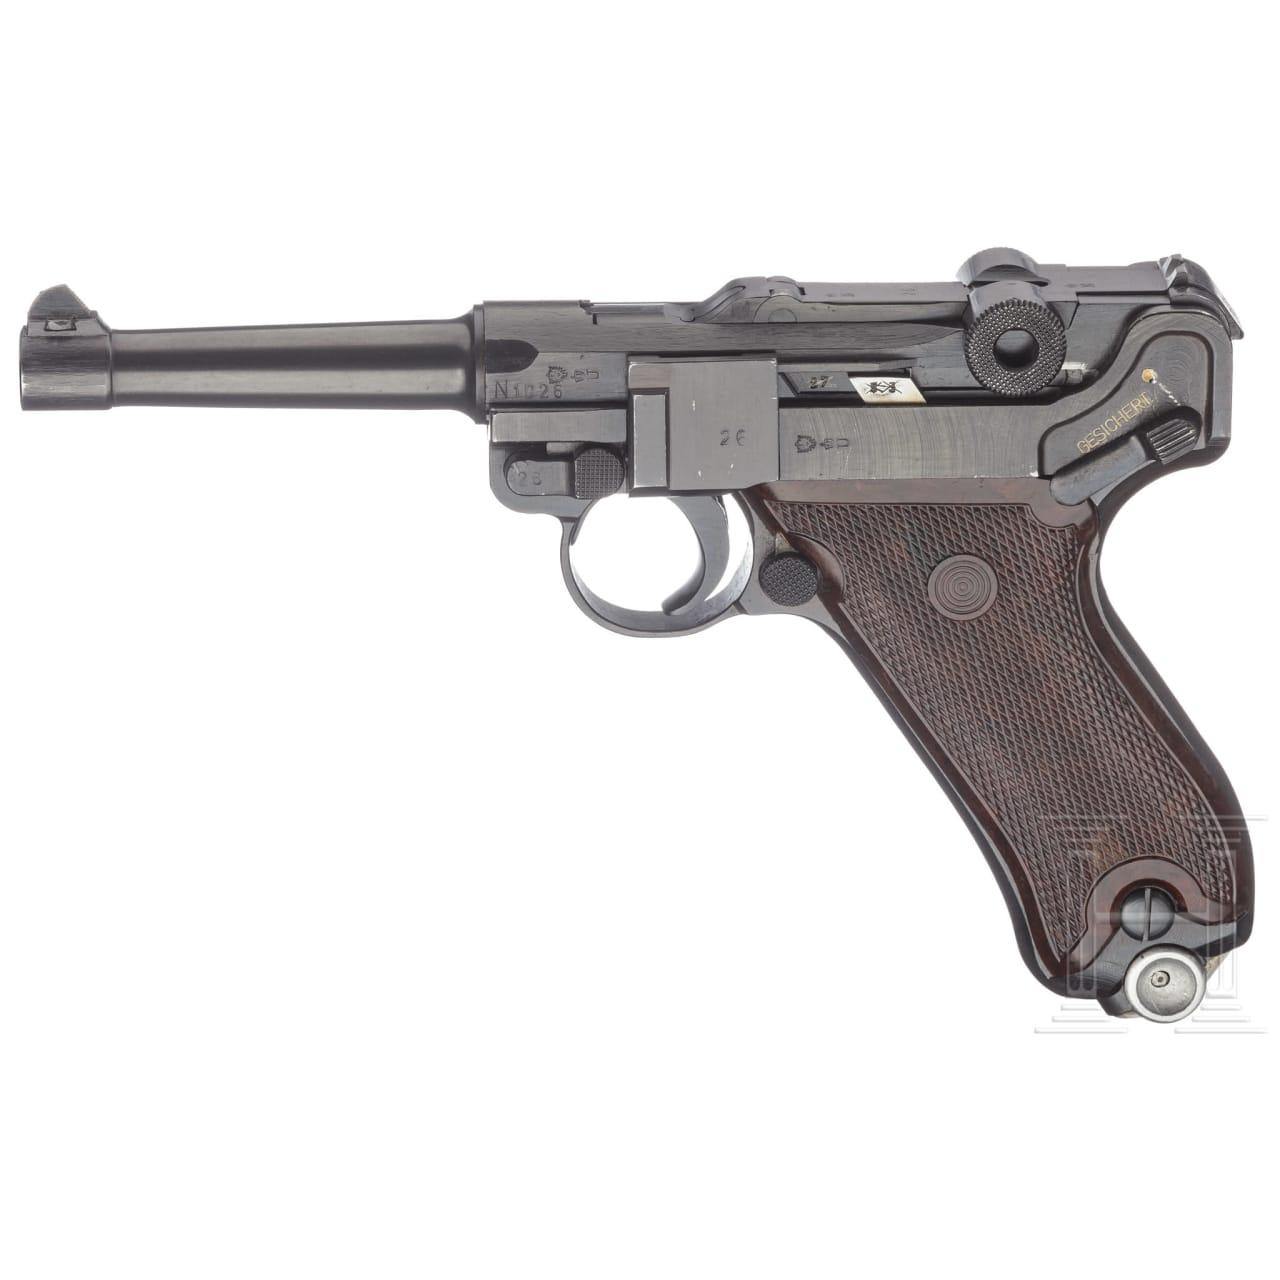 Pistole 08, VEB Thälmann, DDR, Vopo